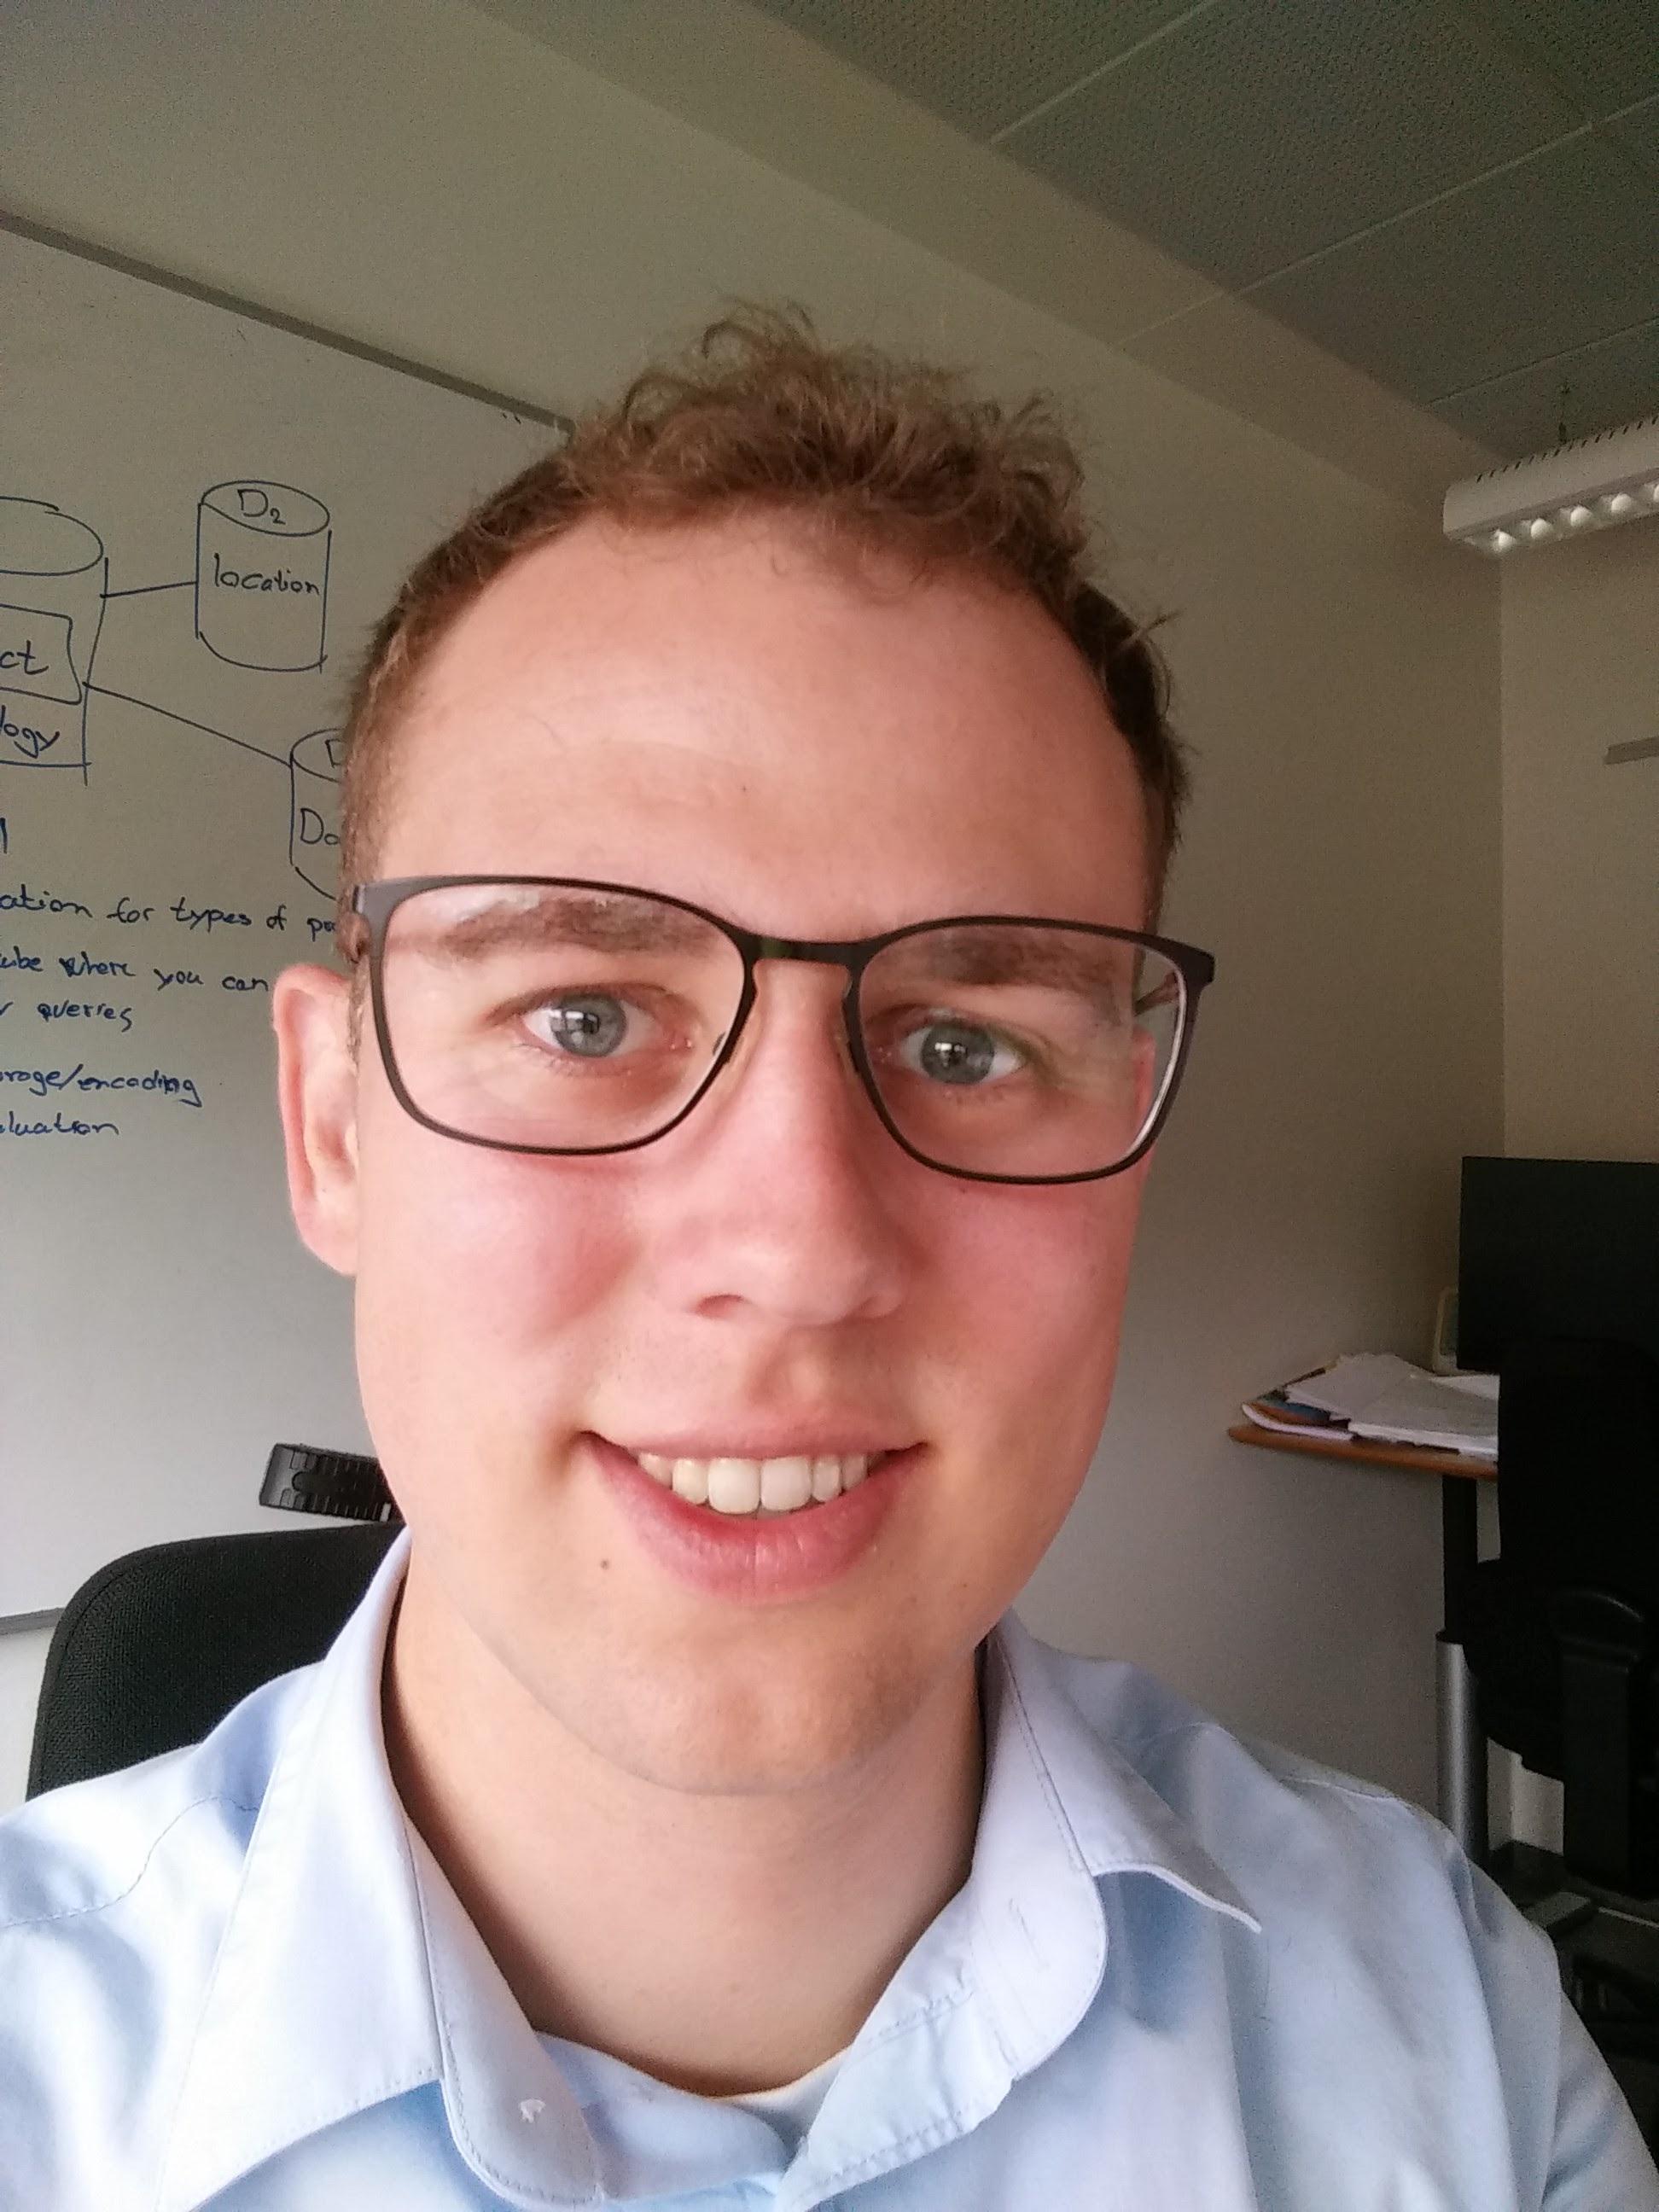 Kim Ahlstrøm Meyn Mathiassen : Ph.D. Candidate